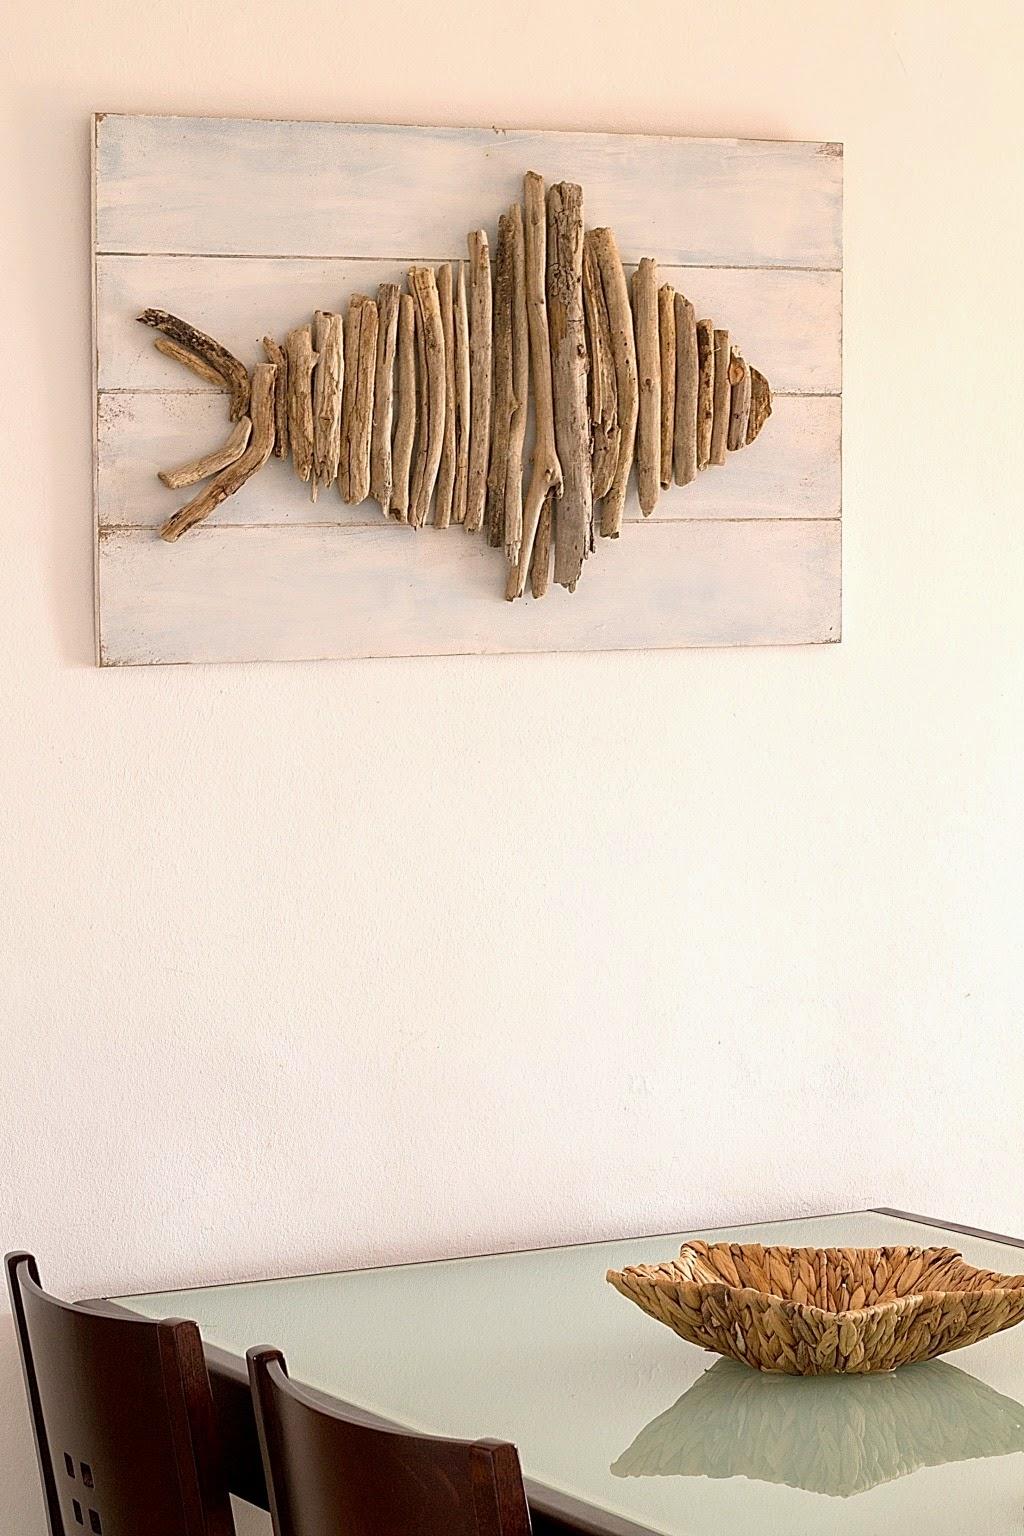 Vicky\'s Home: Diy Madera a la deriva / Diy Driftwood